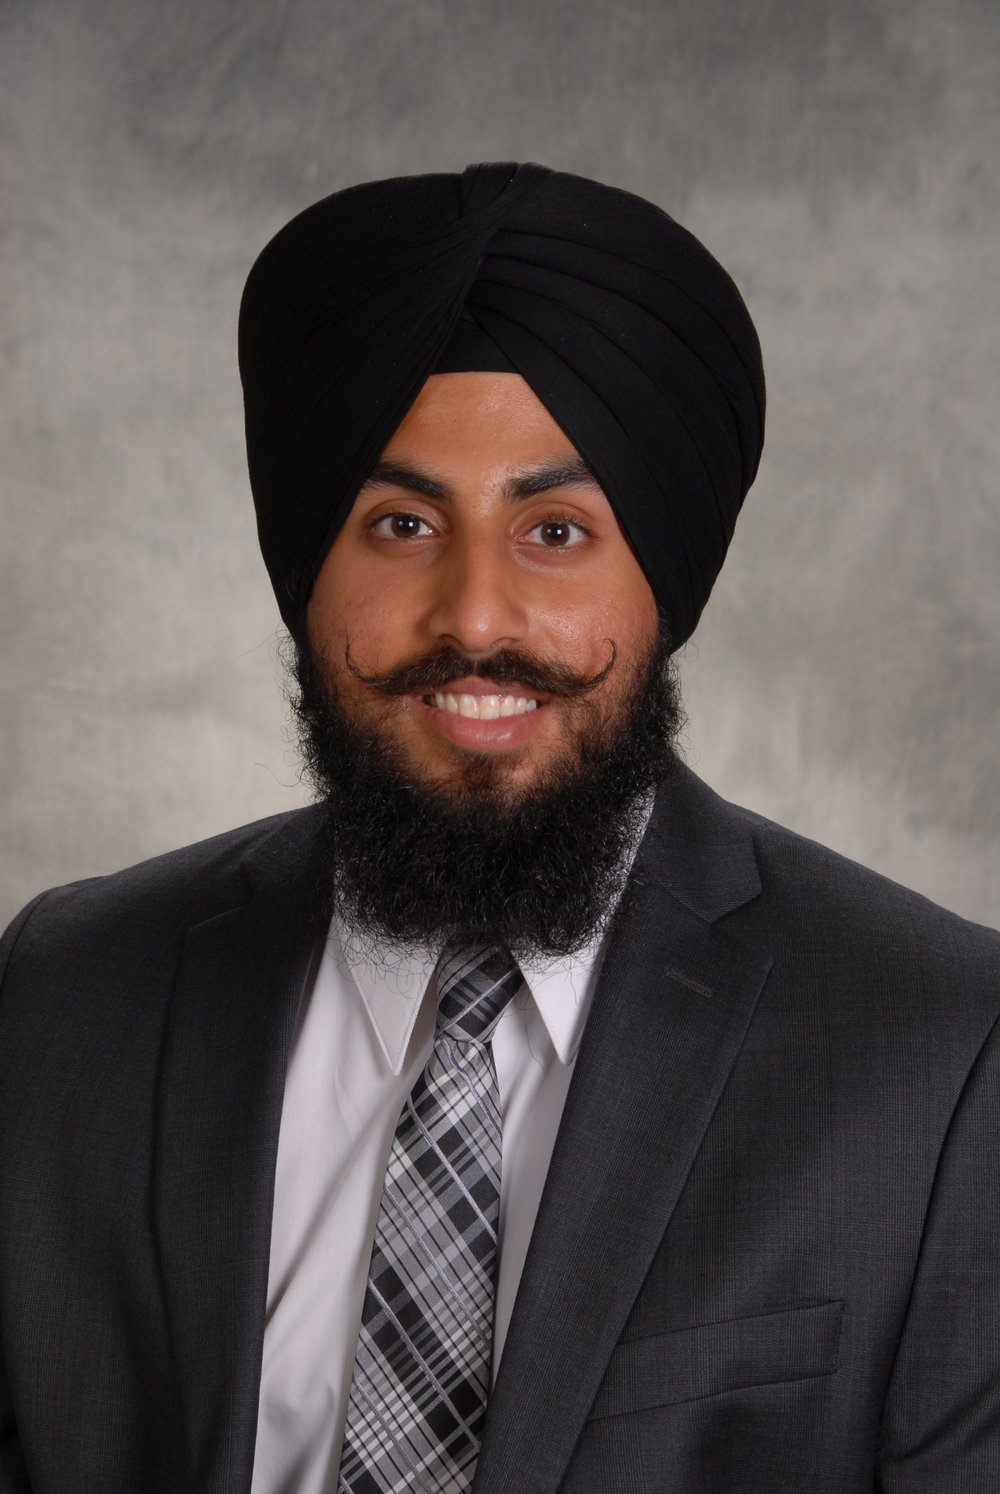 Rajdeep Singh - VPs of Fundraising